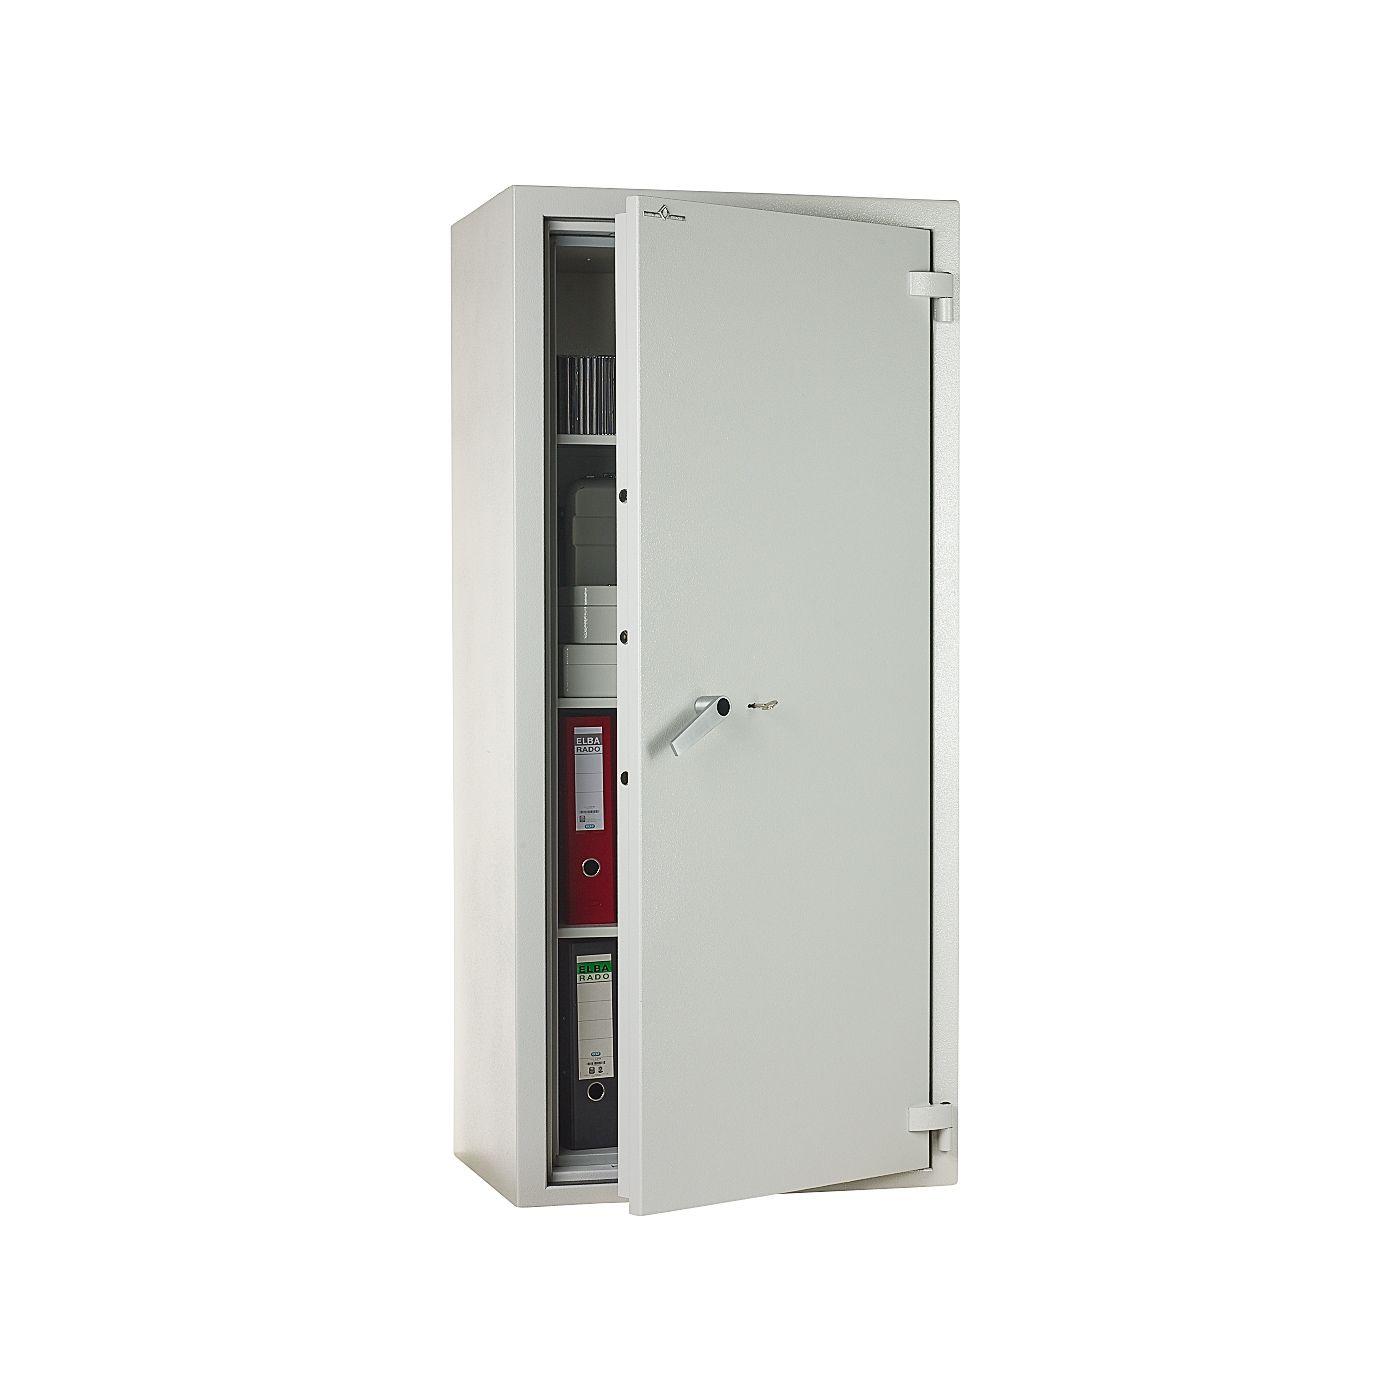 Hpktf 300 07 Fireproof Steel Filing Cabinets Hartmann Tresore